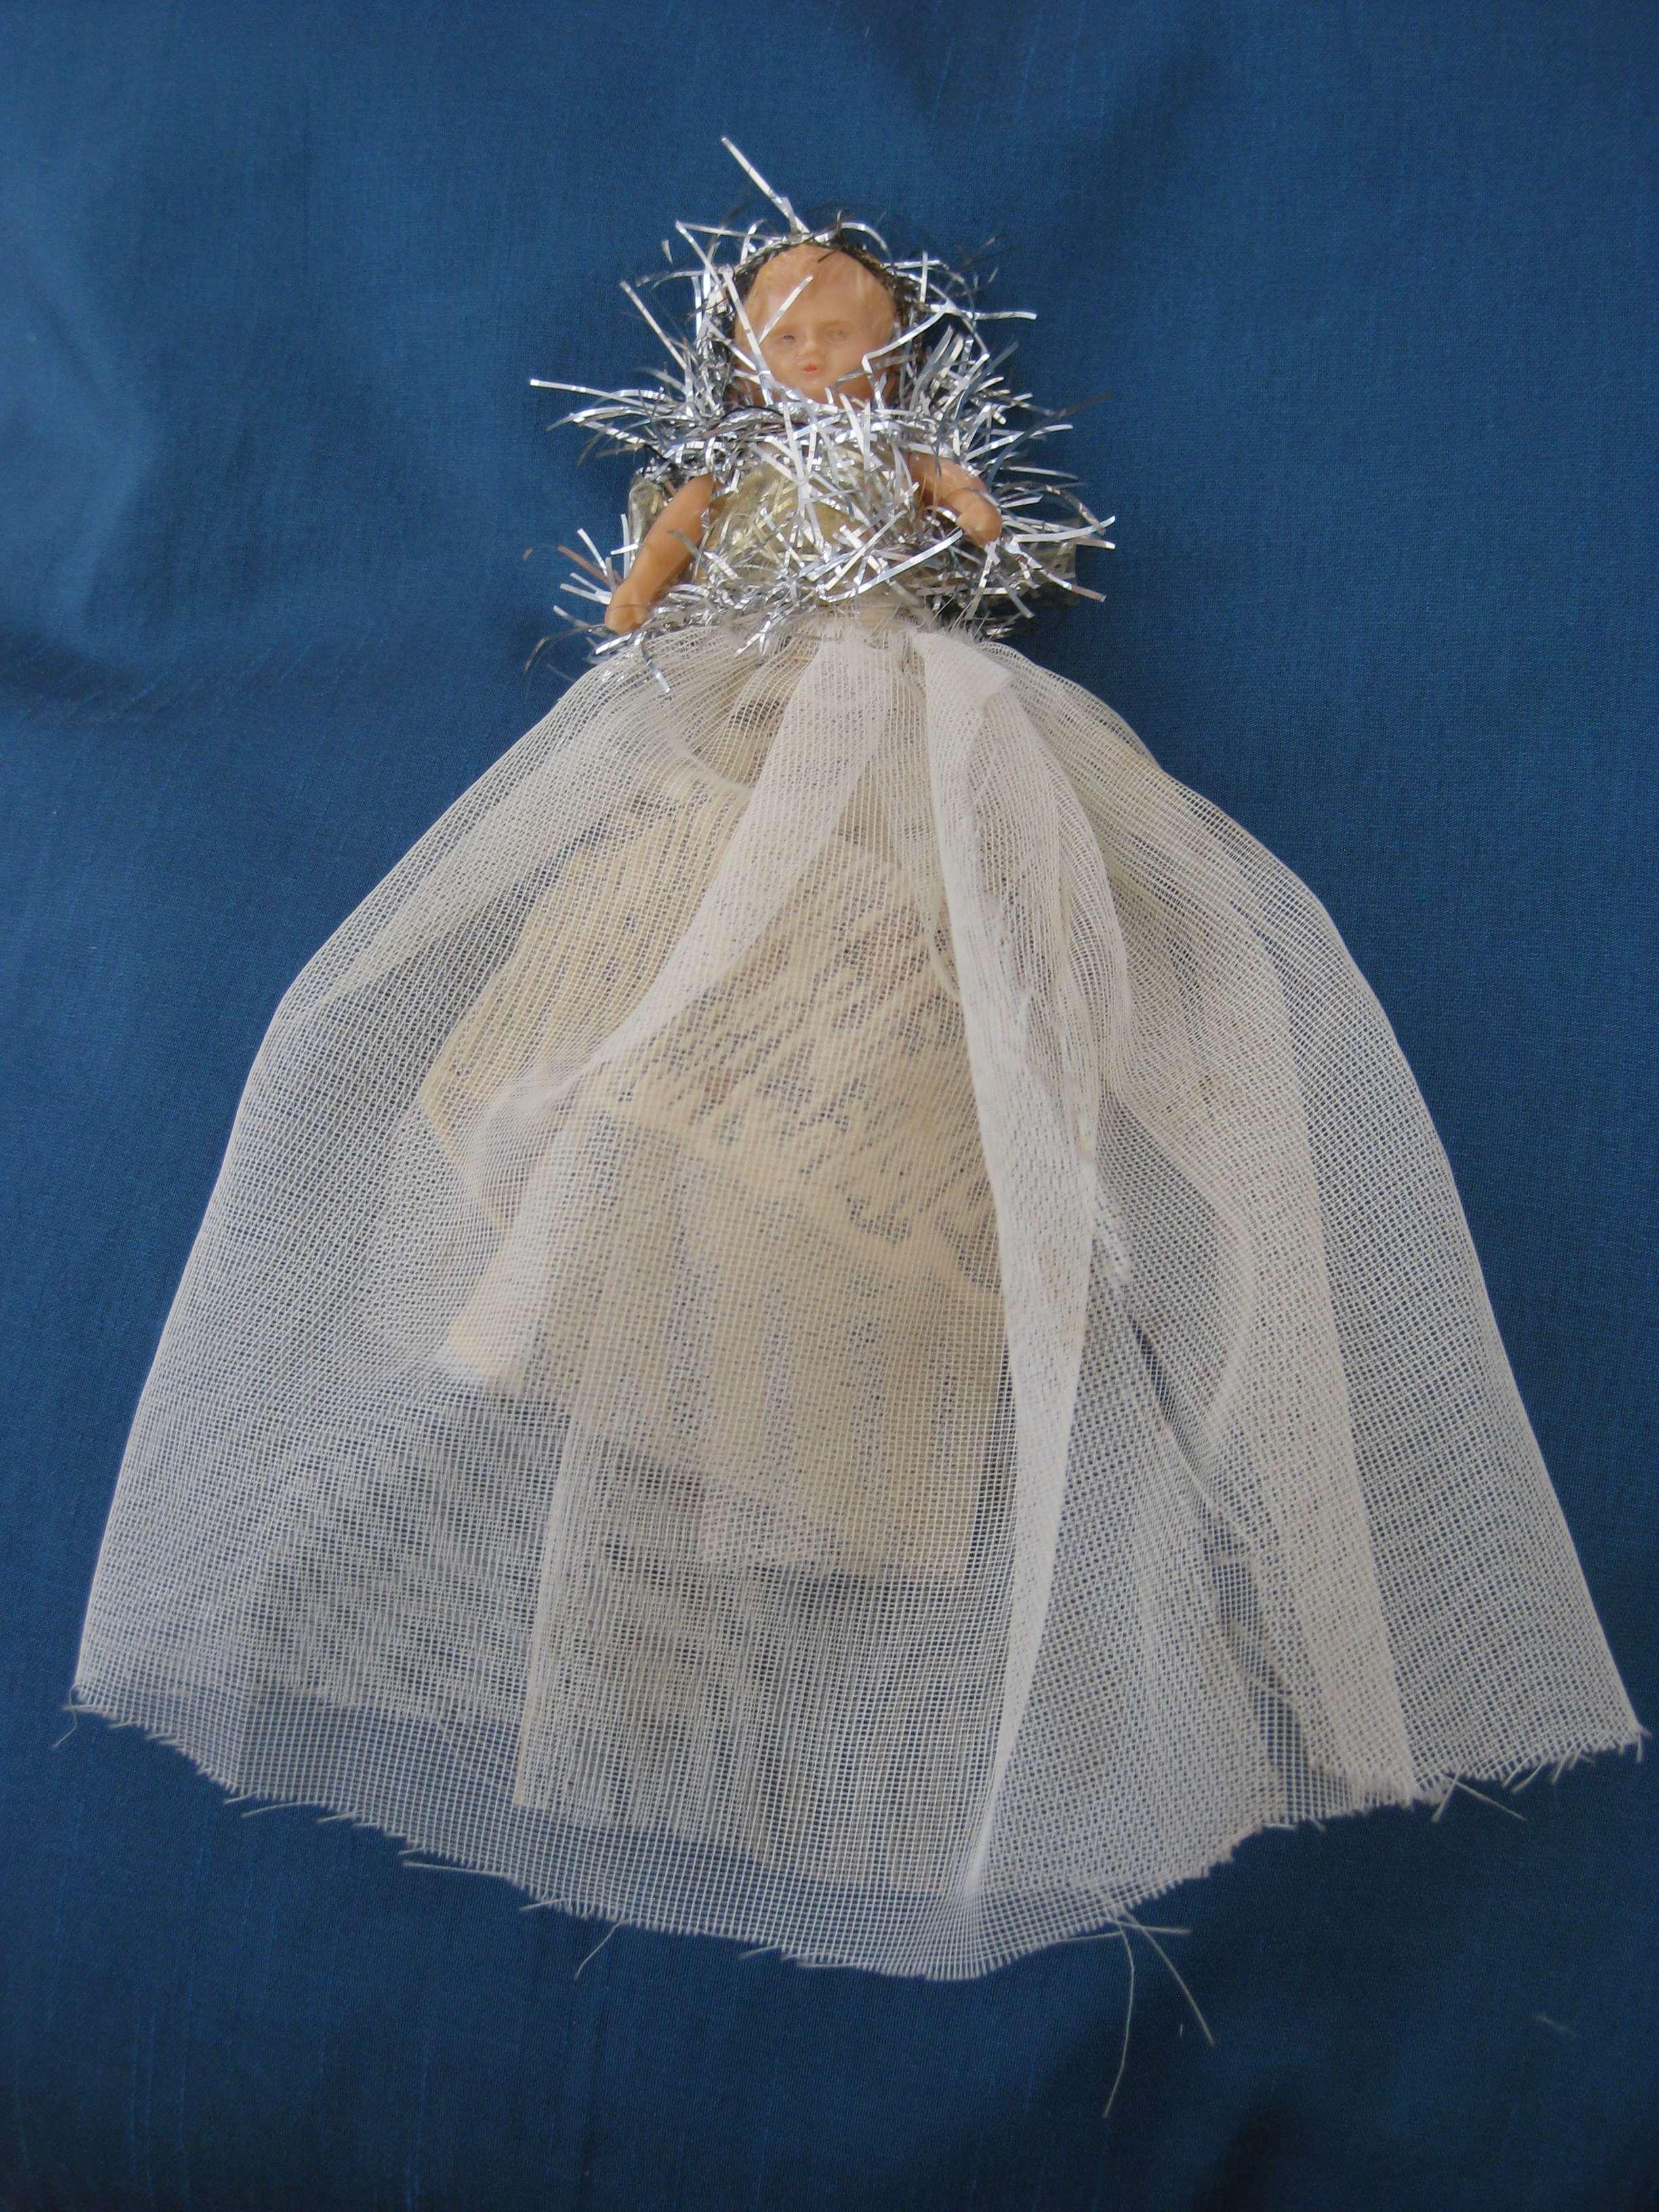 Fairy before for blog